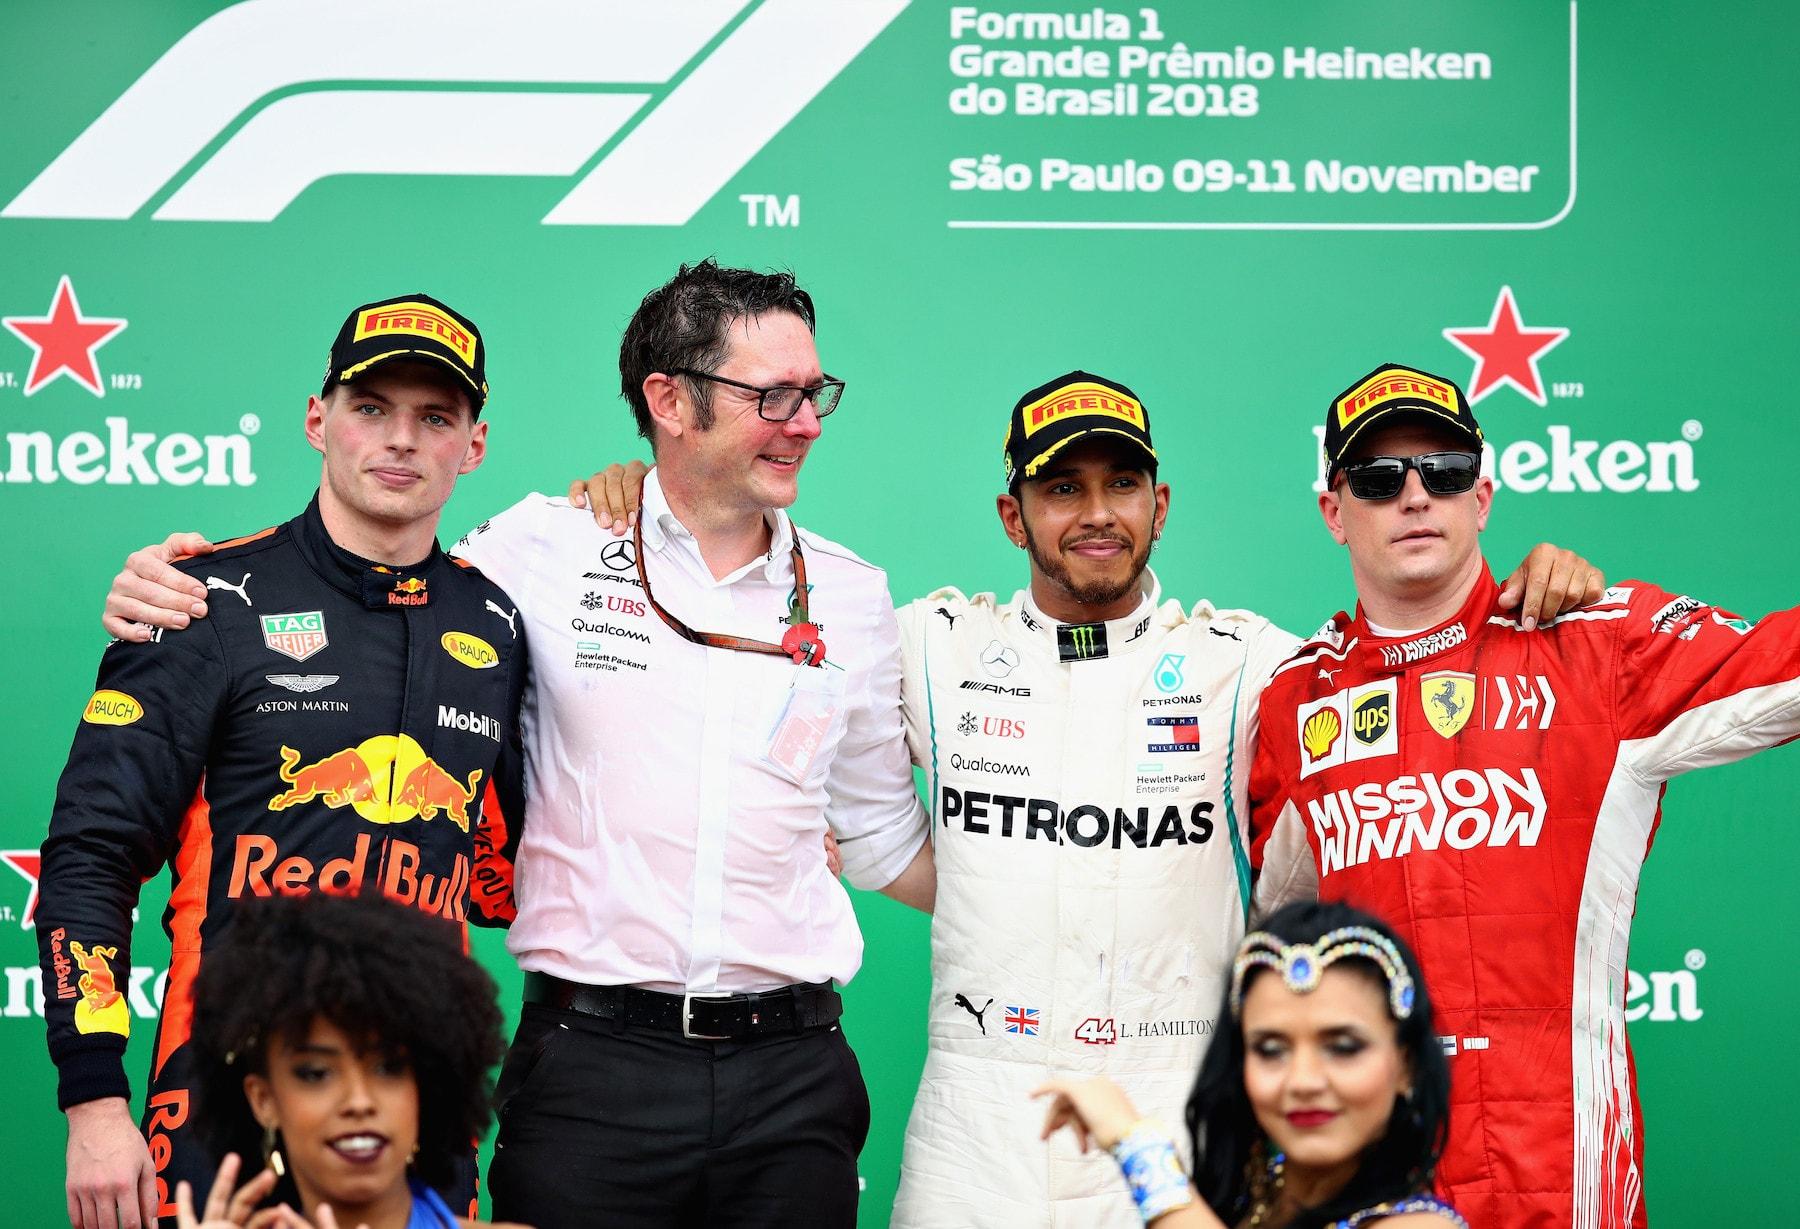 T 2018 Brazilian GP podium | 2018 Brazilian GP 1 copy.jpg